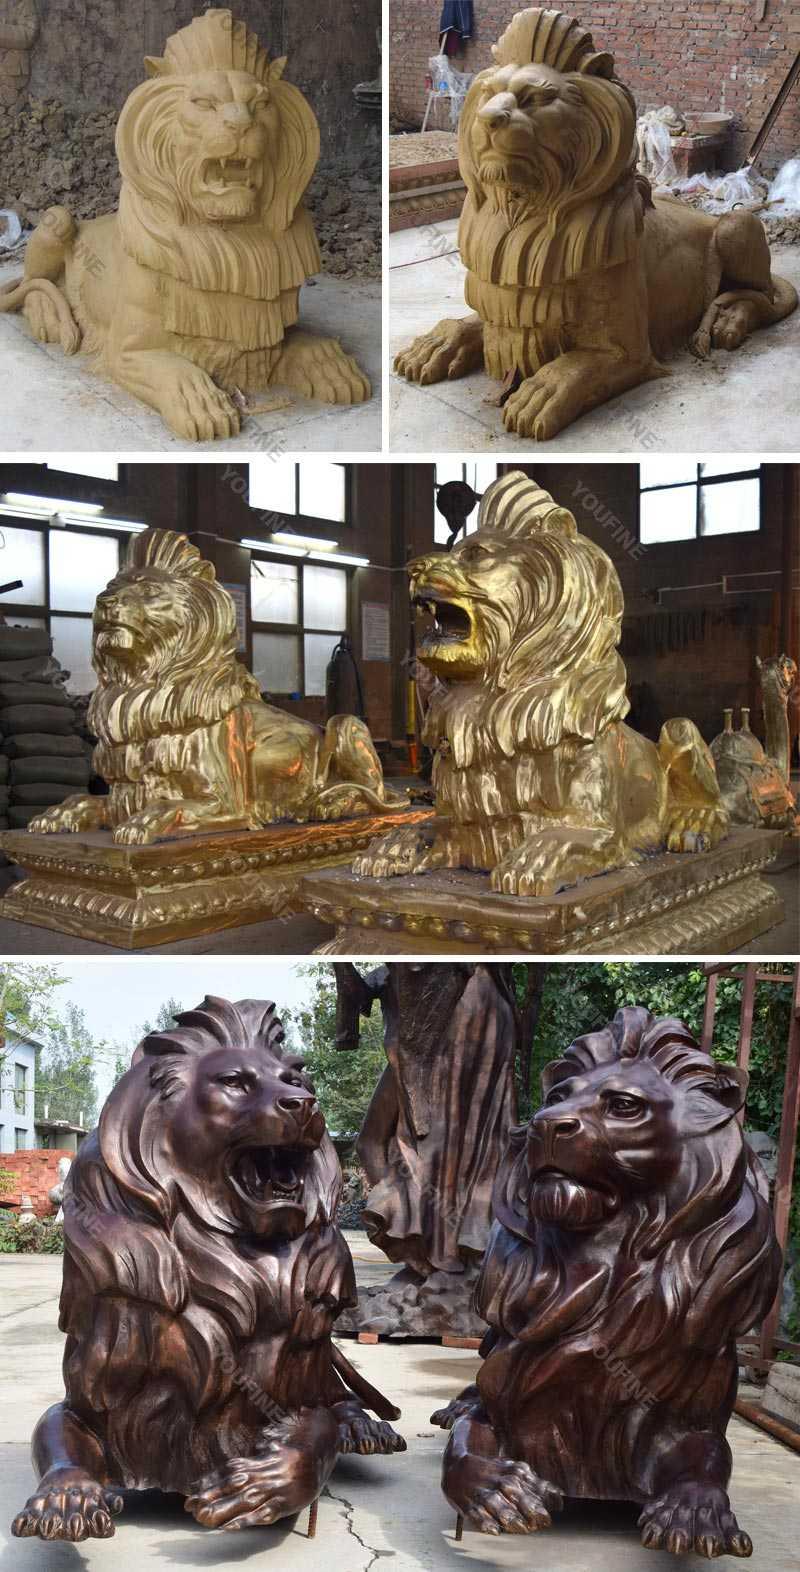 Buy life size guardian lion statue pair of bronze lying lion statue for front porch decor for sale